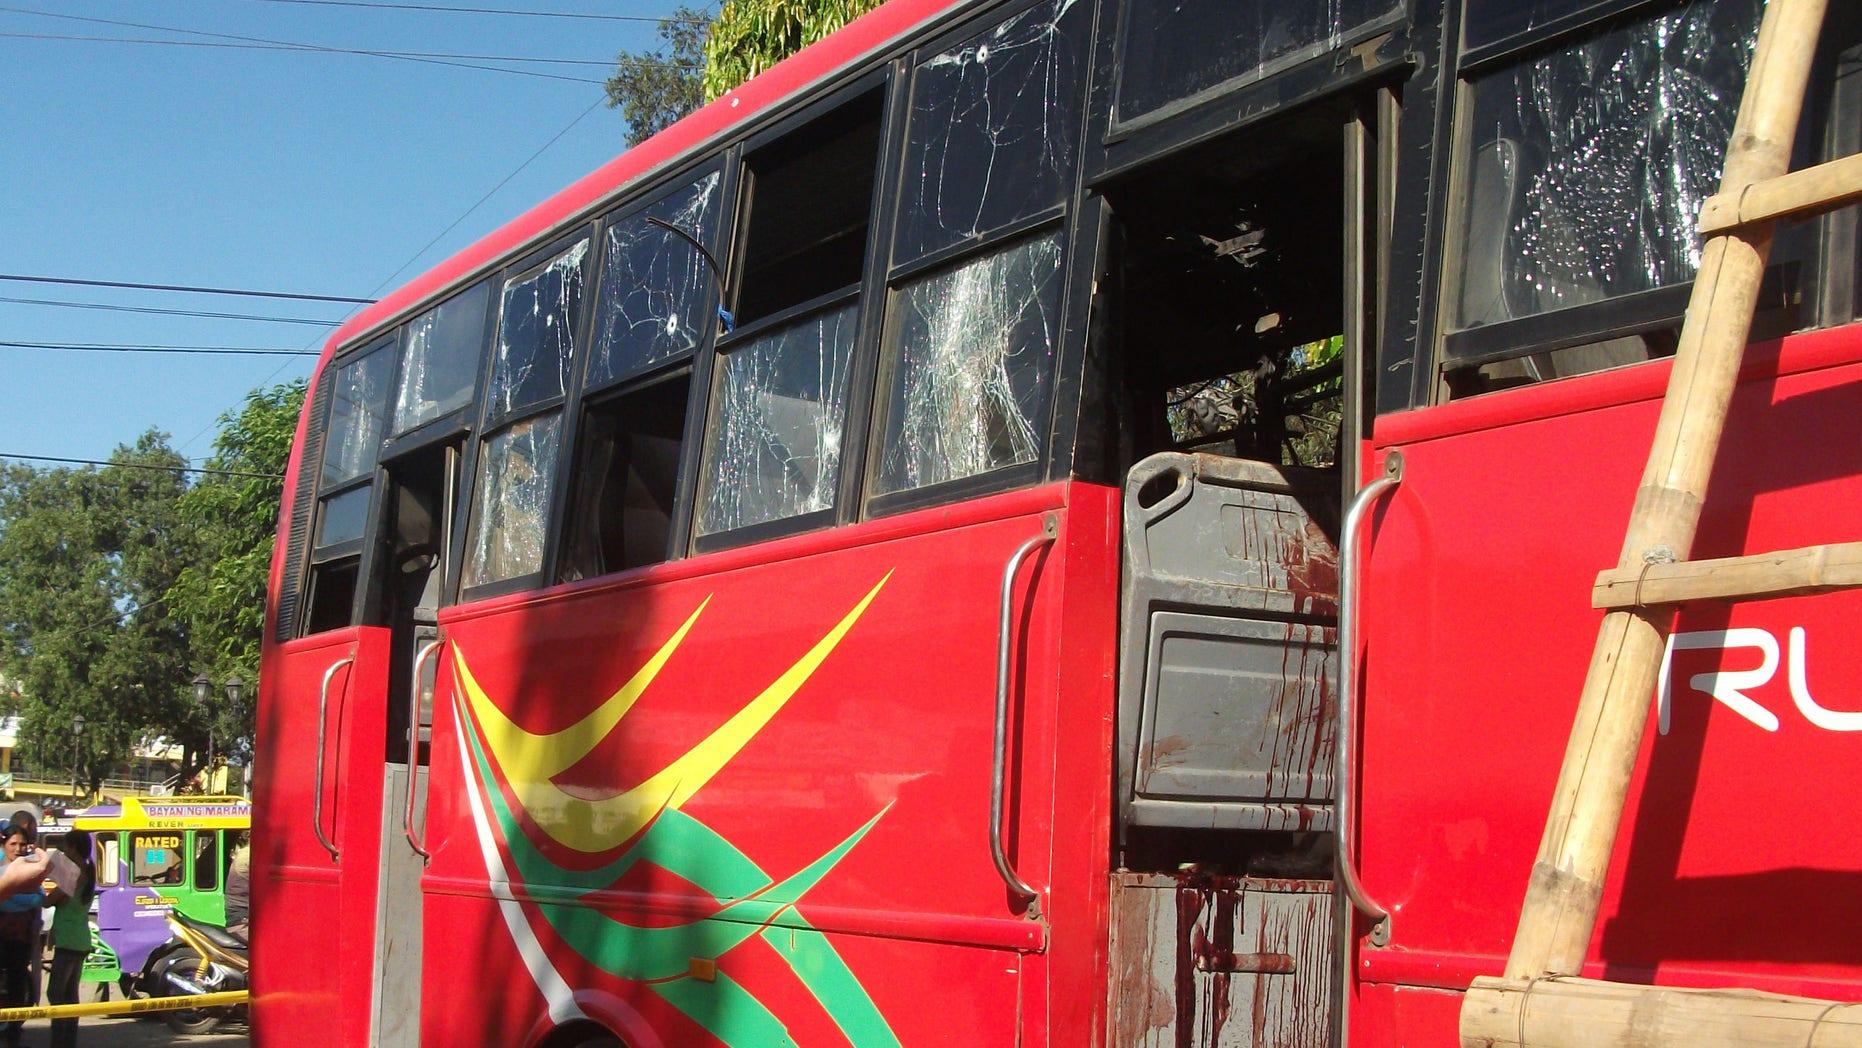 Dec. 10, 2014: Investigators examine the blood-splattered passenger bus